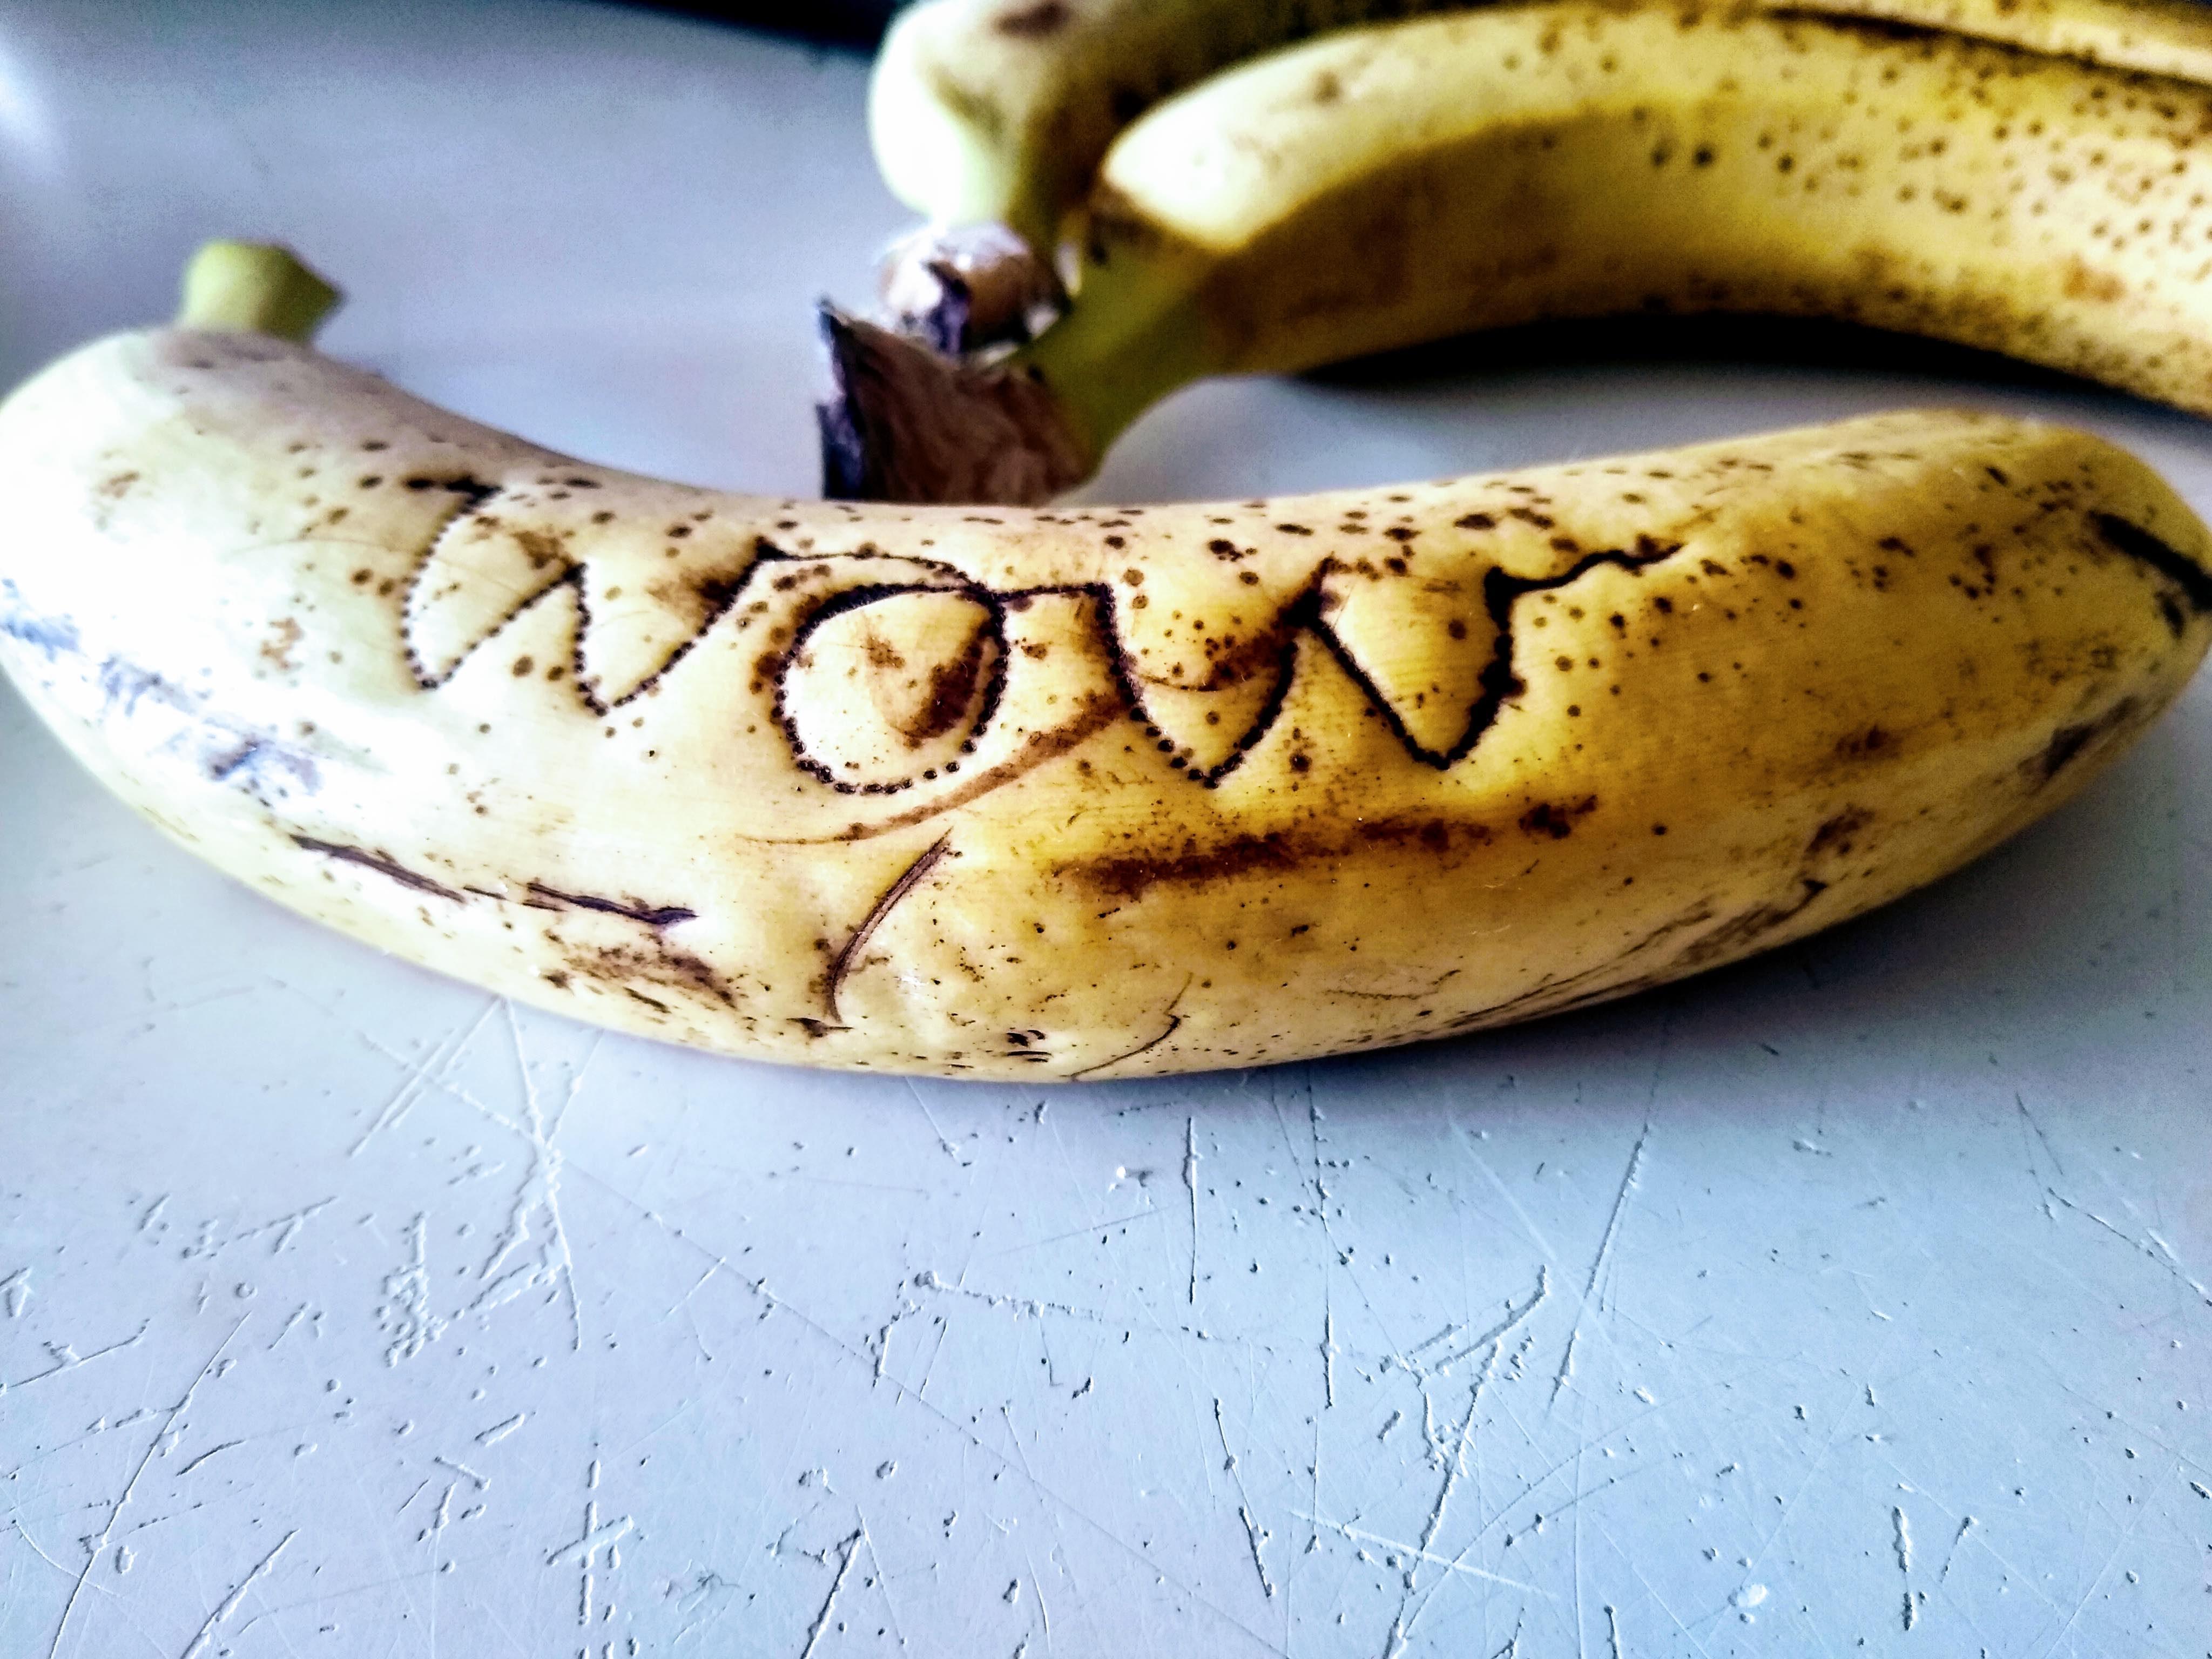 Tattooed Banana saying 'wow'